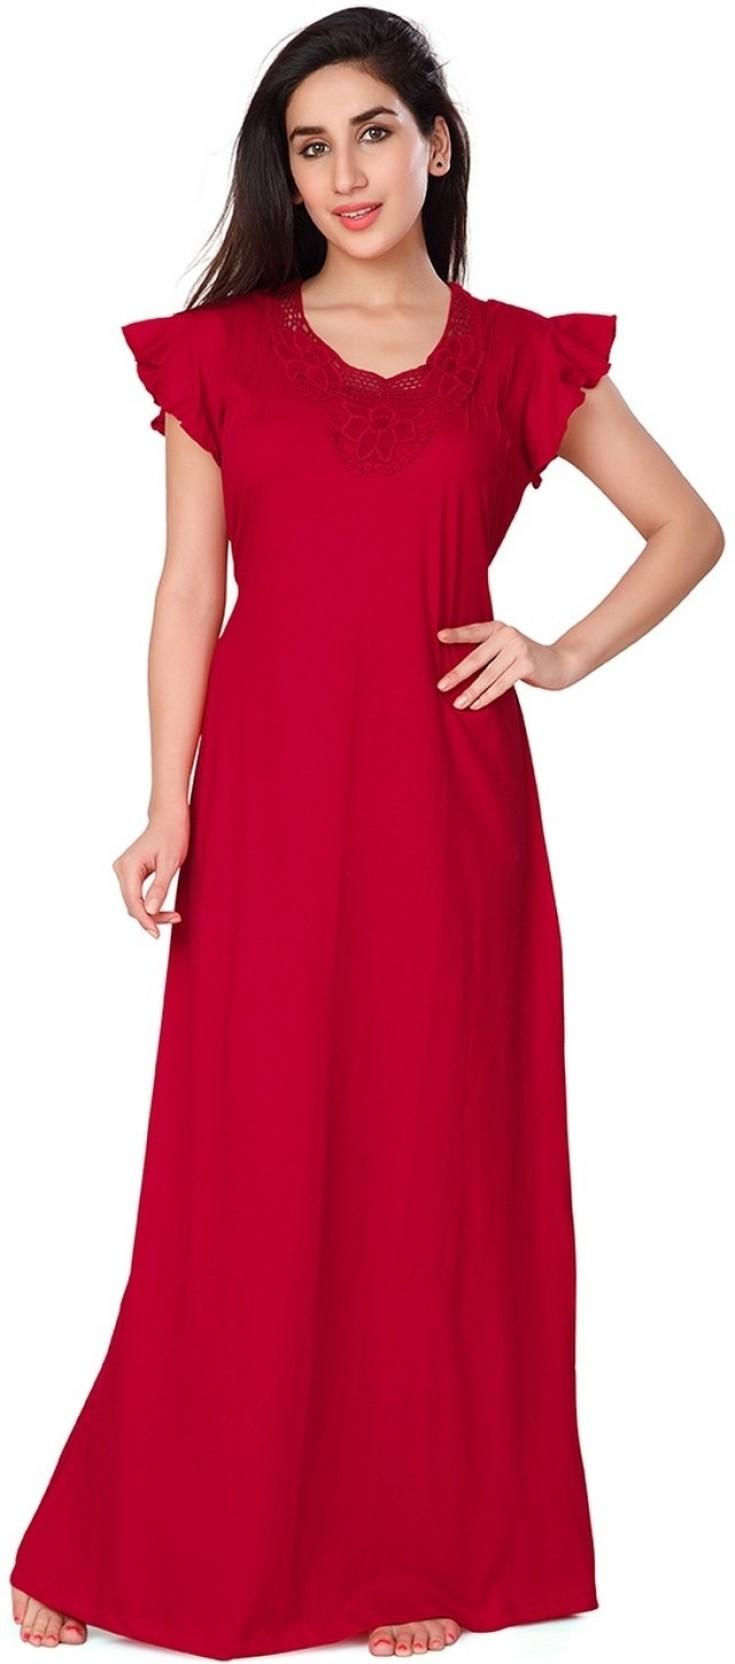 bf61a7a9c7 Honeydew Women Nighty - Buy Red Honeydew Women Nighty Online at Best ...